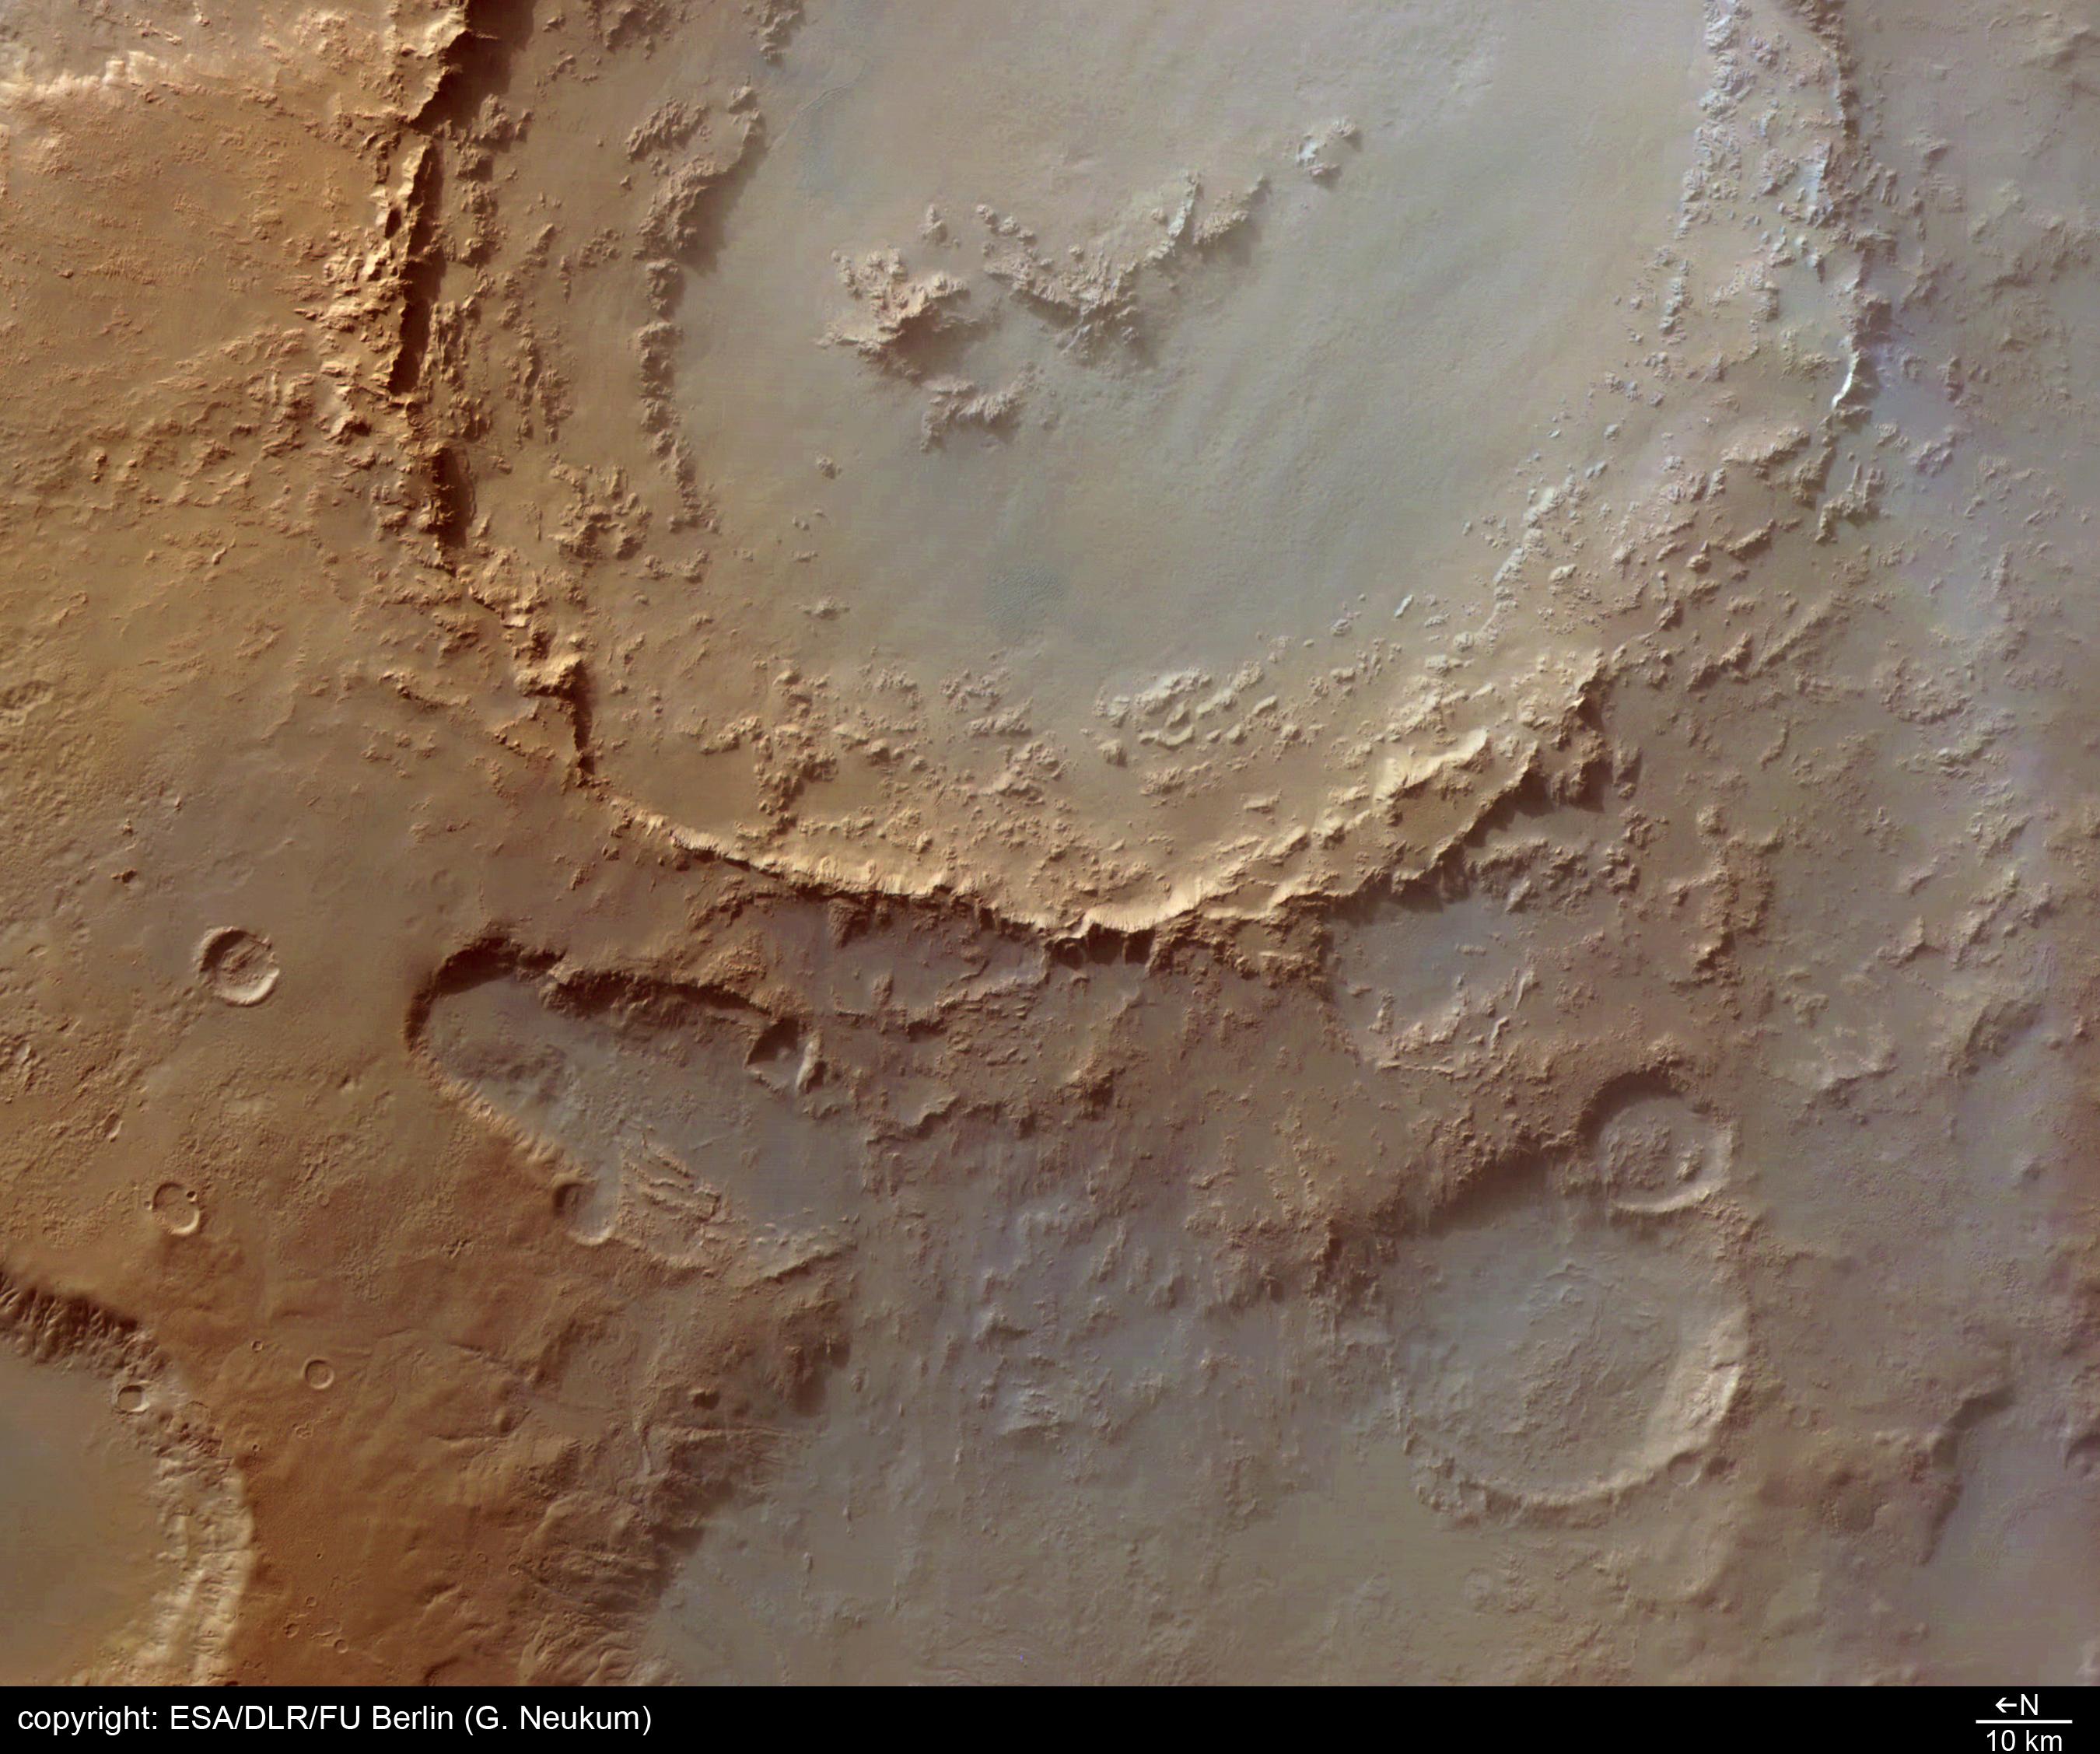 1567240234503-Hale_Crater.jpe